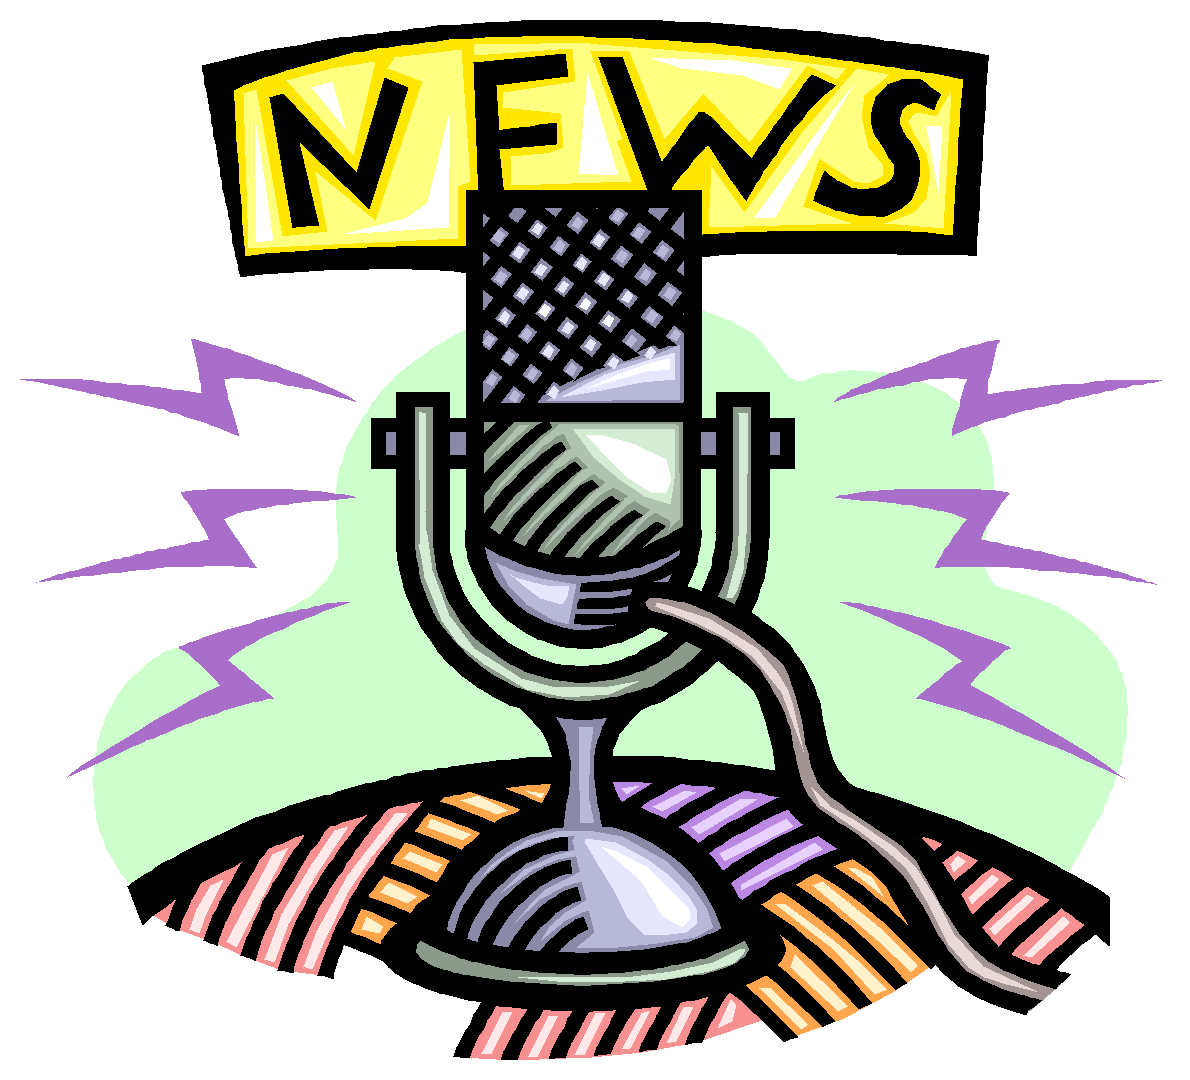 News clipart news story. Elem educ